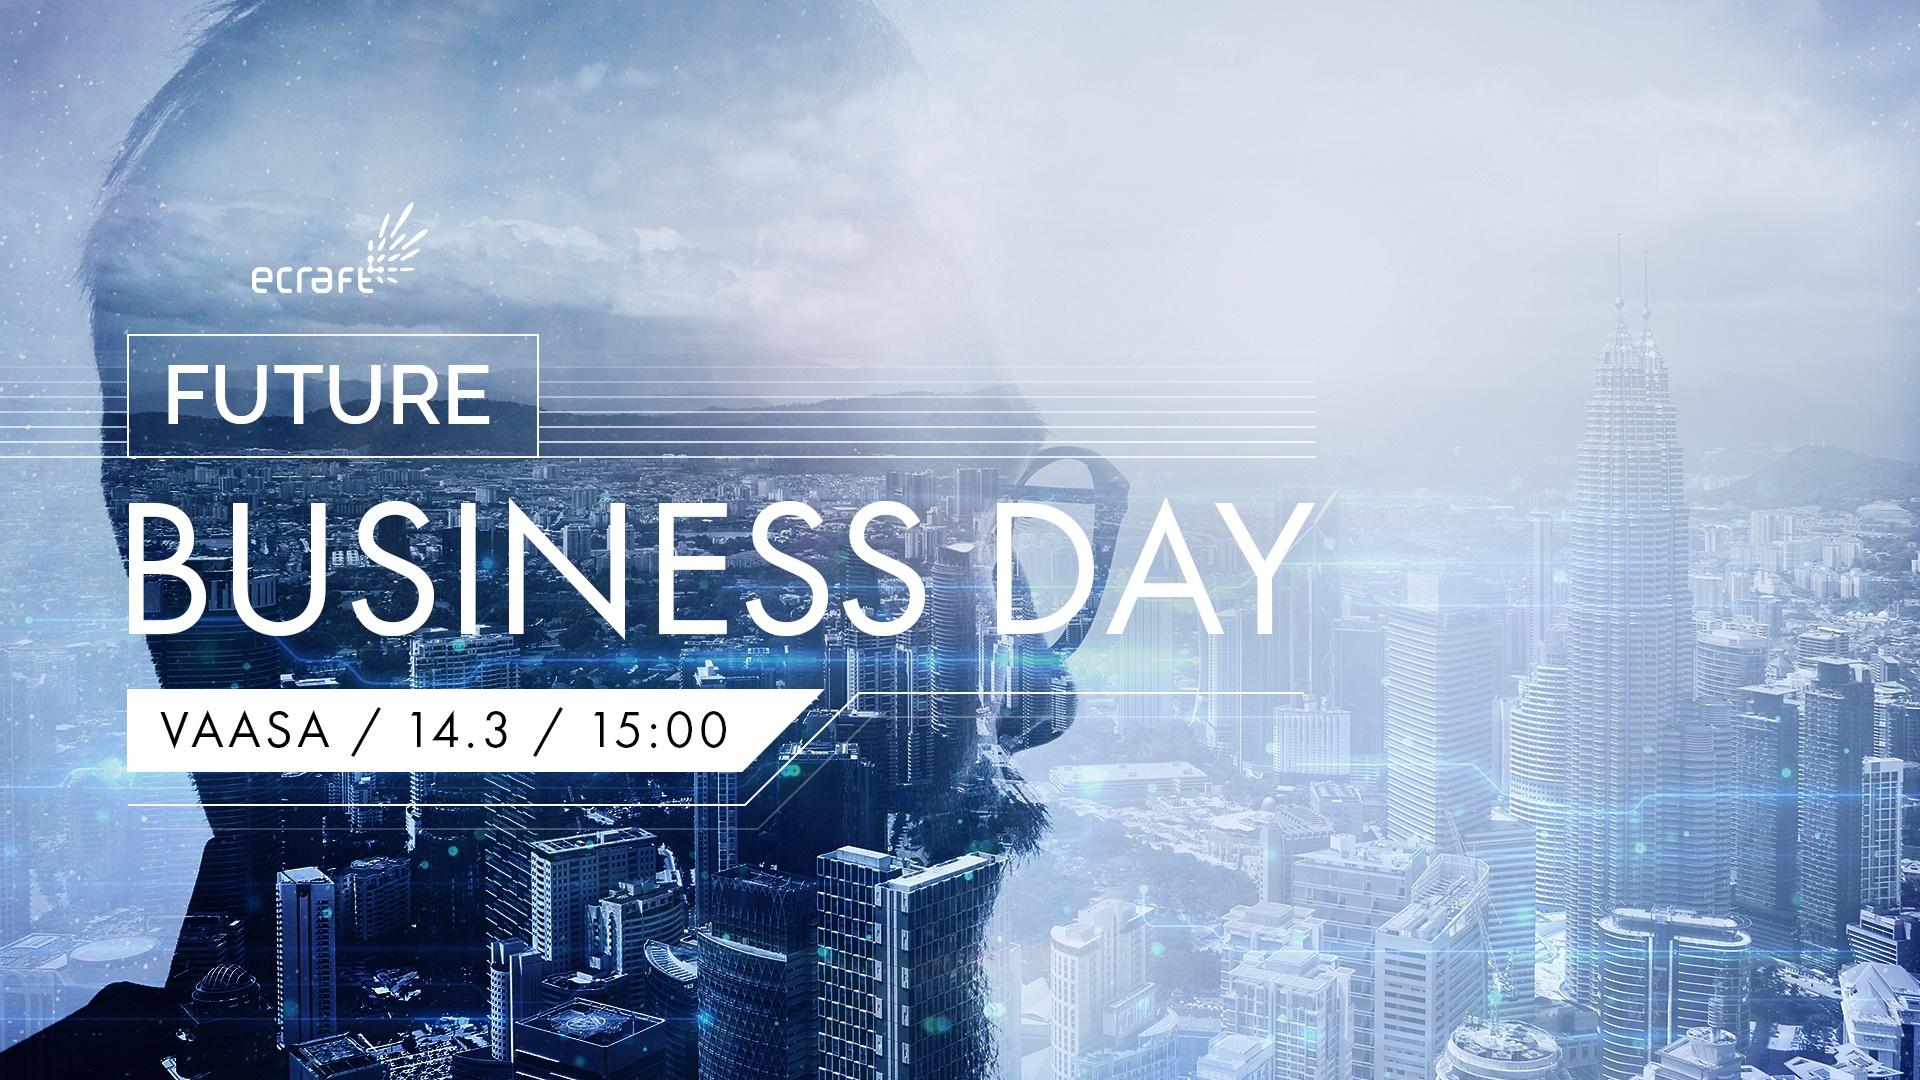 eCraft-Future-Business-Day